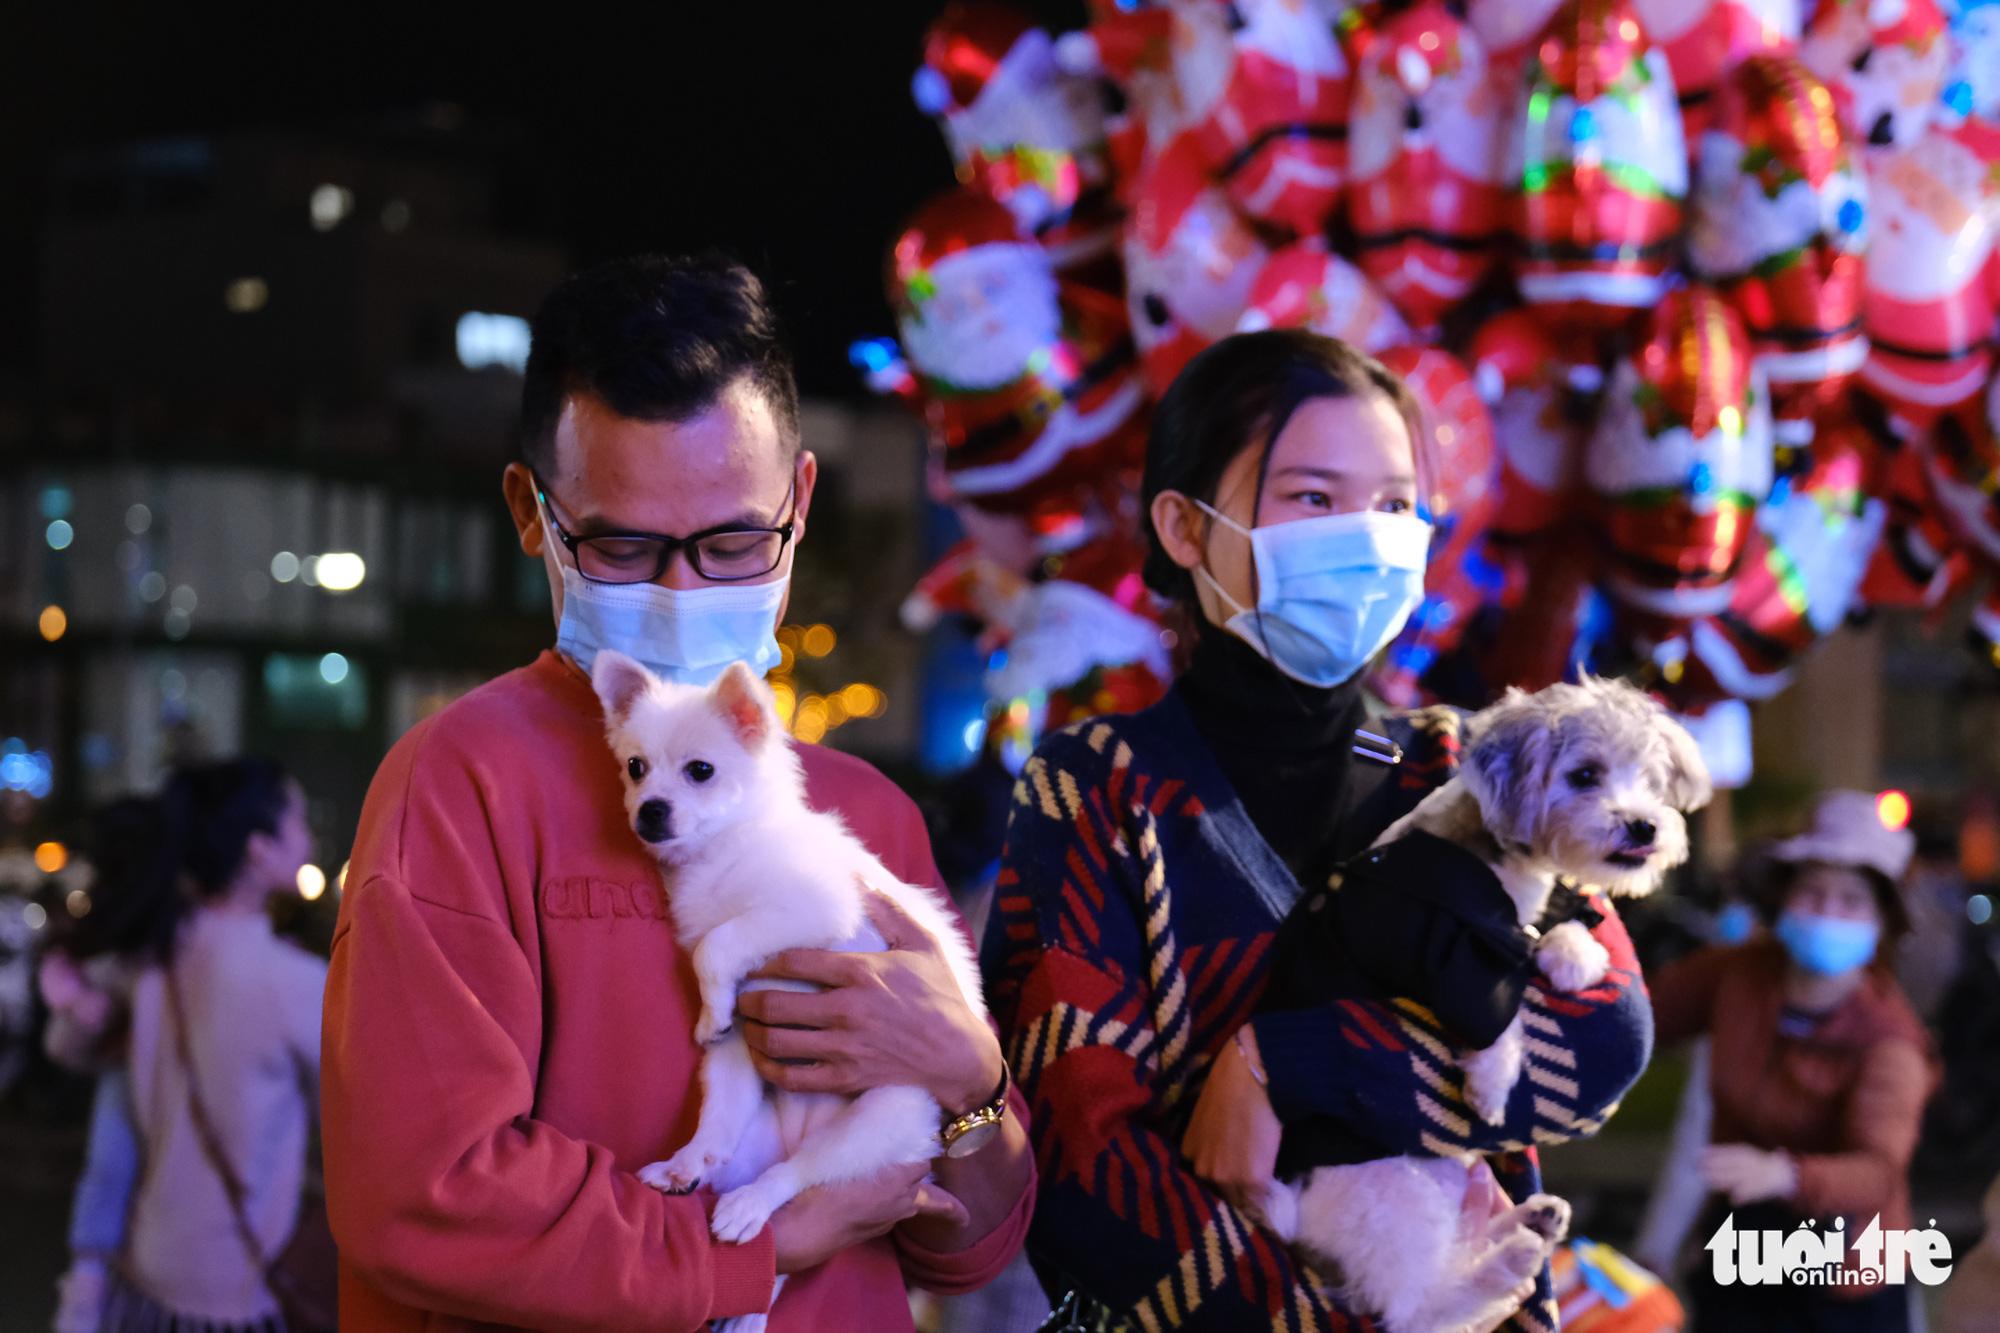 A couple brings their pets to downtown Da Nang City to mark Christmas Eve, December 24, 2020. Photo: Tan Luc / Tuoi Tre